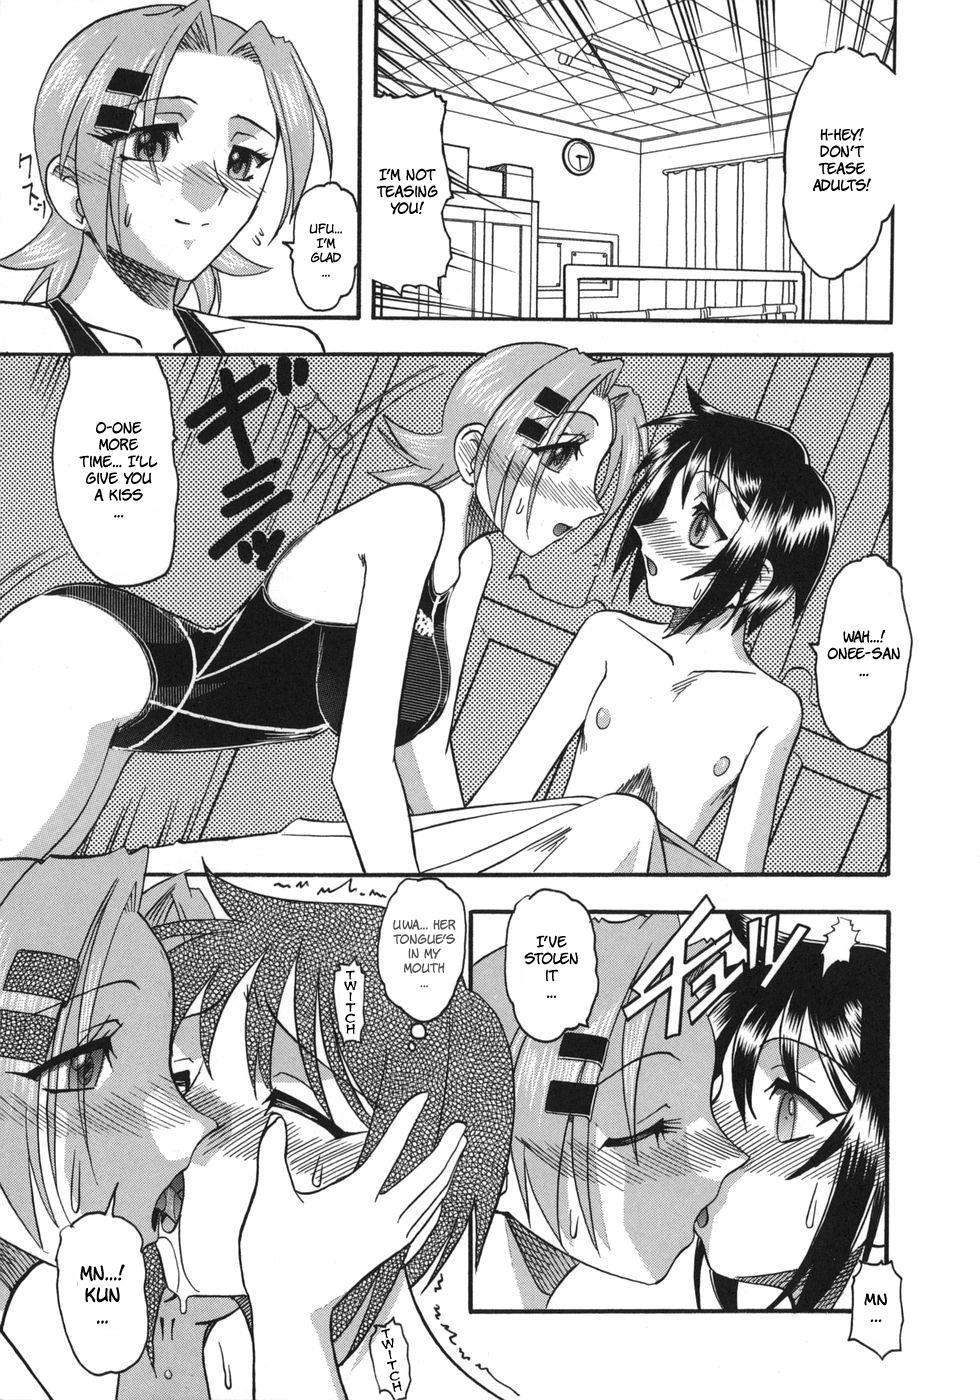 Hadaka Yori Hiwai - She is dirtier than nakedness 154